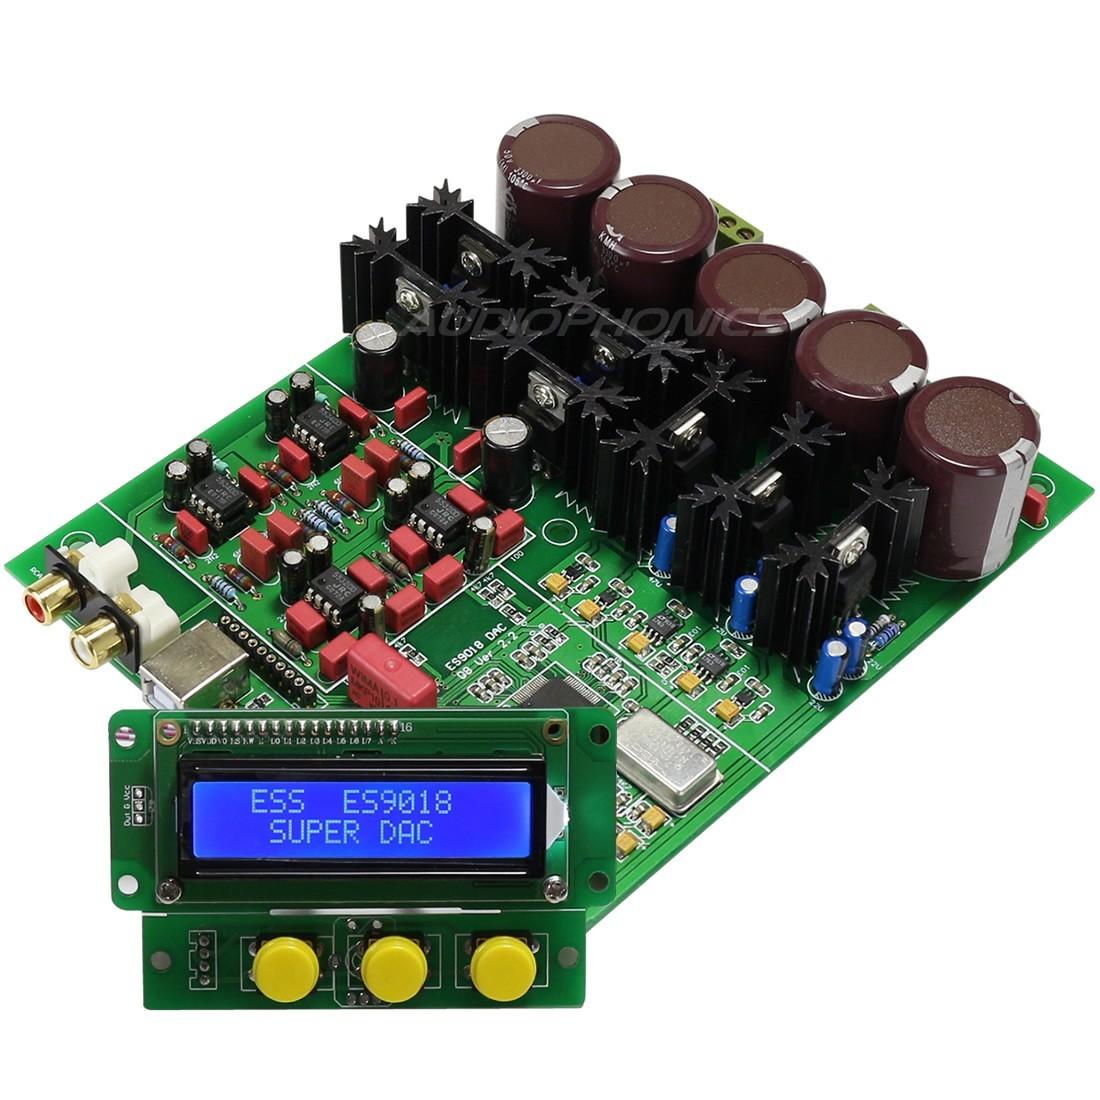 ESS ES9018 DAC Module Board 32bit 384khz DSD 3x LM317T Regulators